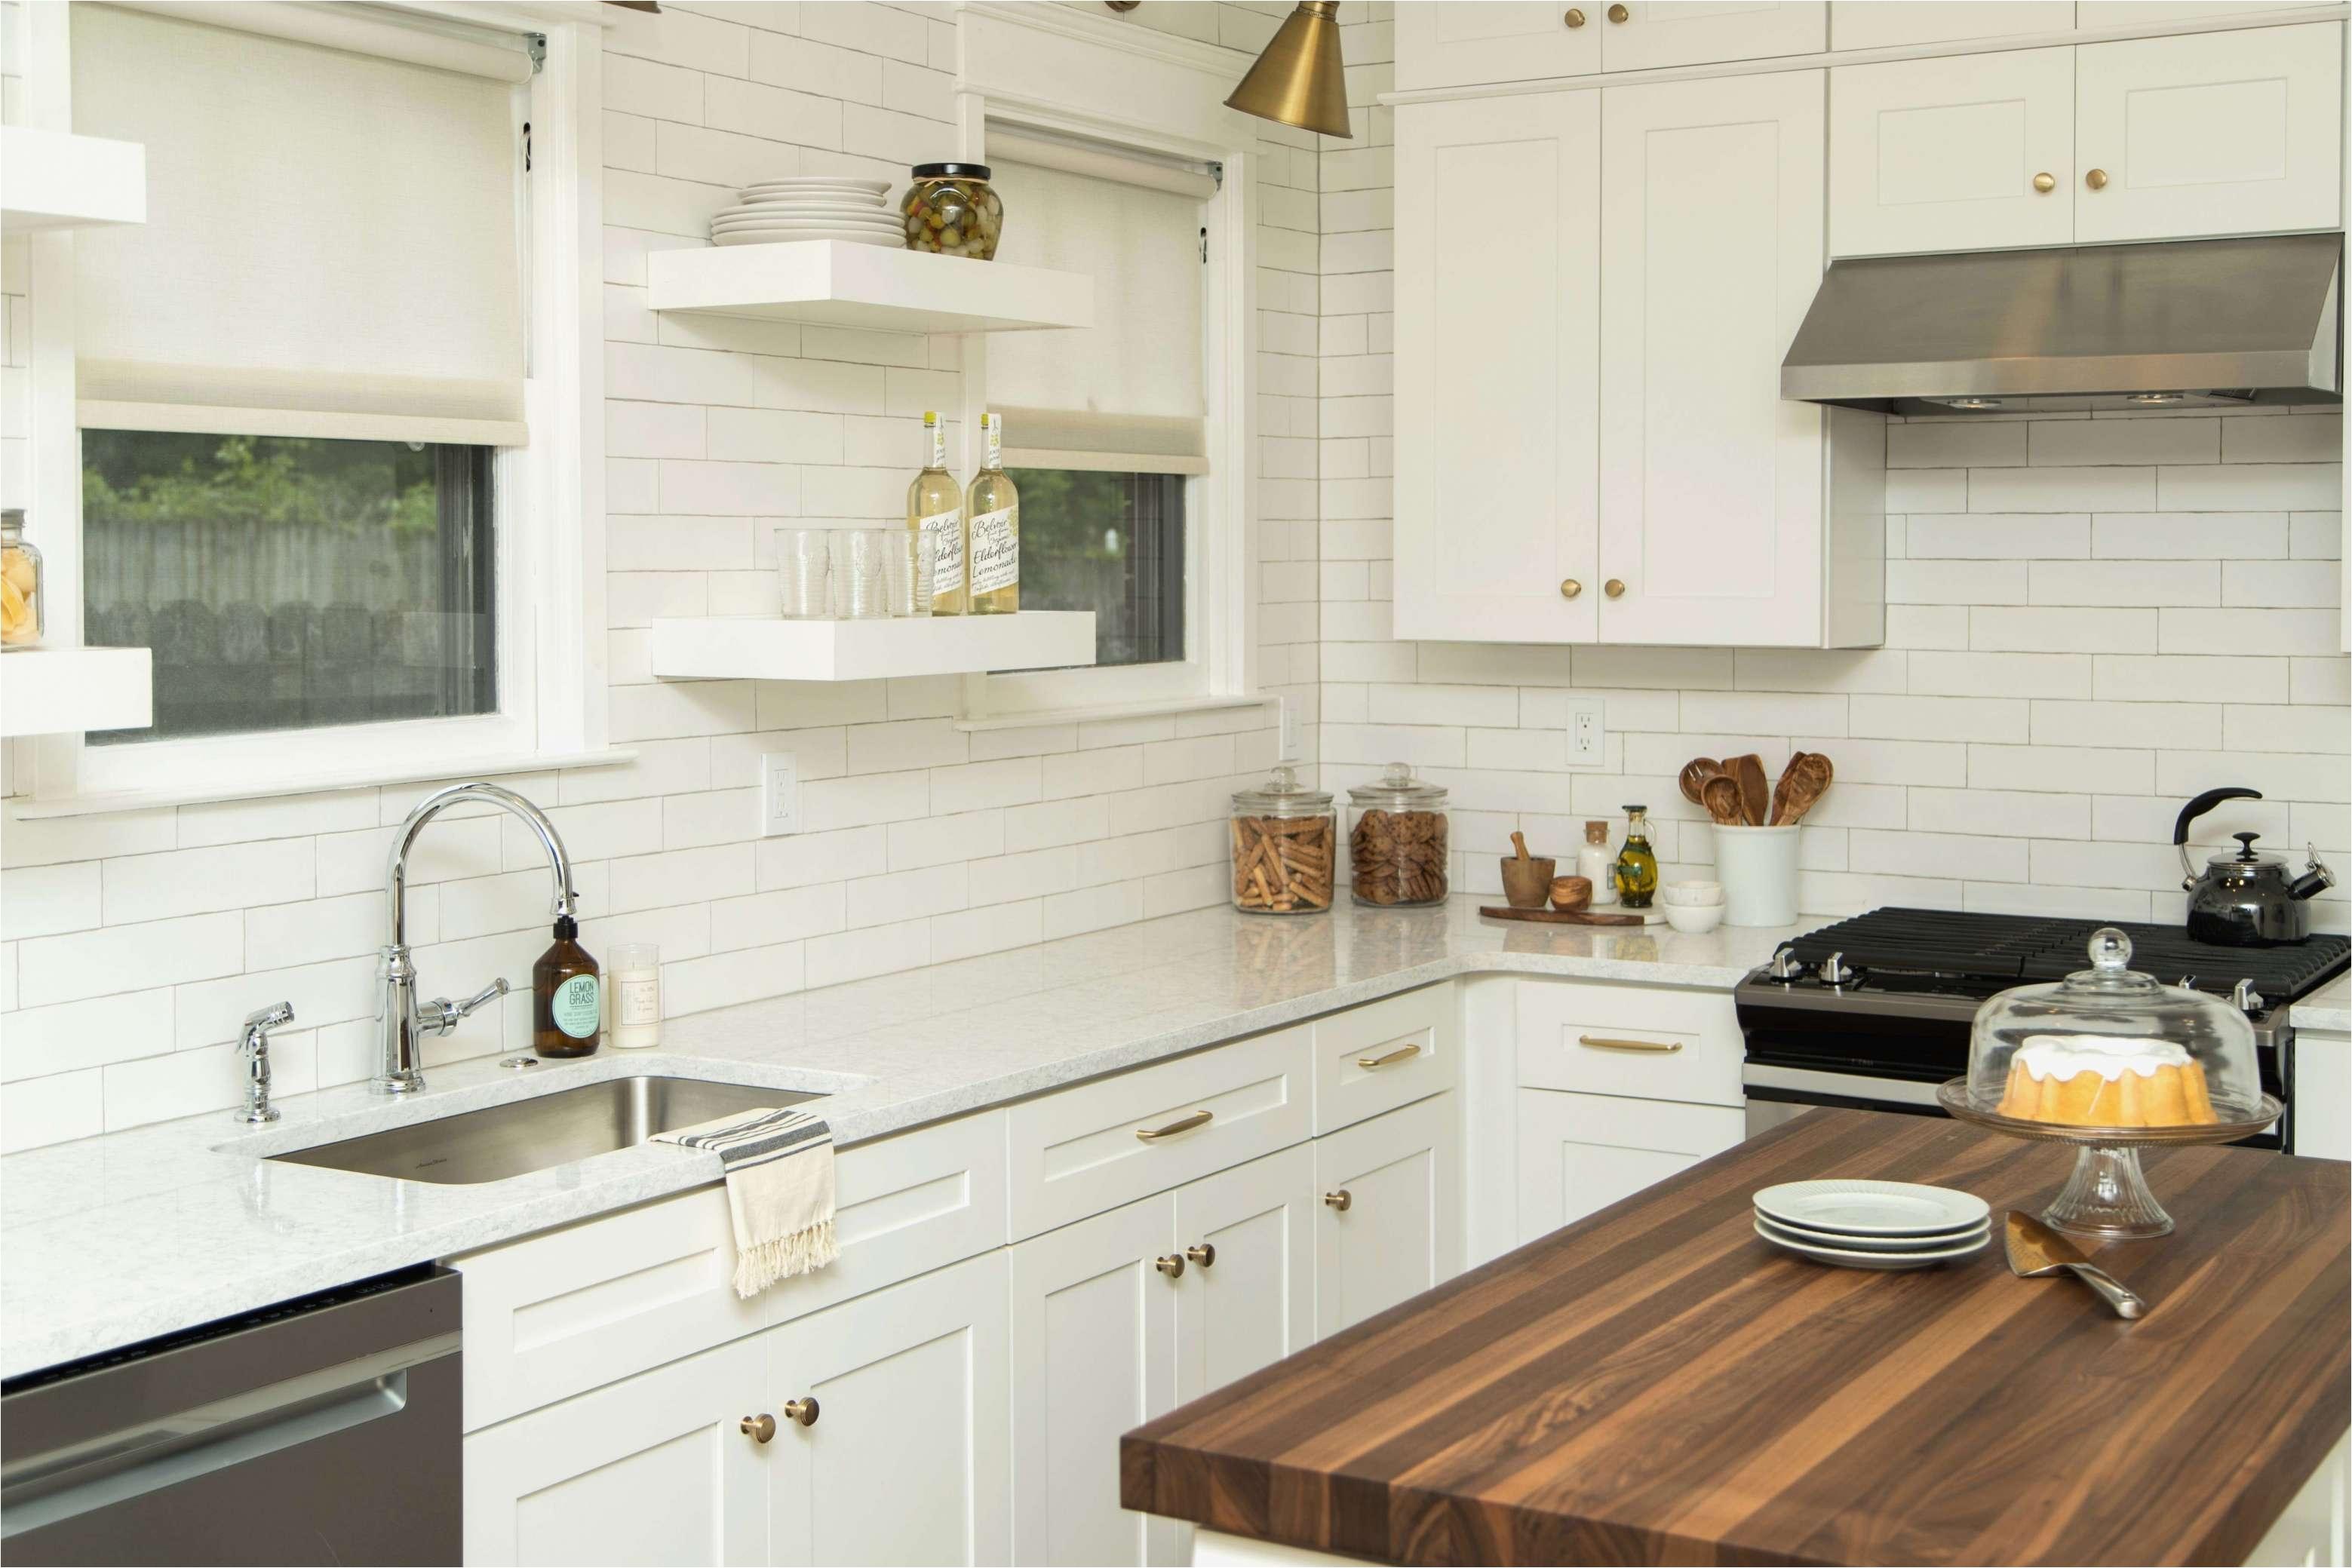 Fair Modern Kitchen Design 2017 Small Kitchen Design Examples Awesome Atlanta Kitchen 0d Archives